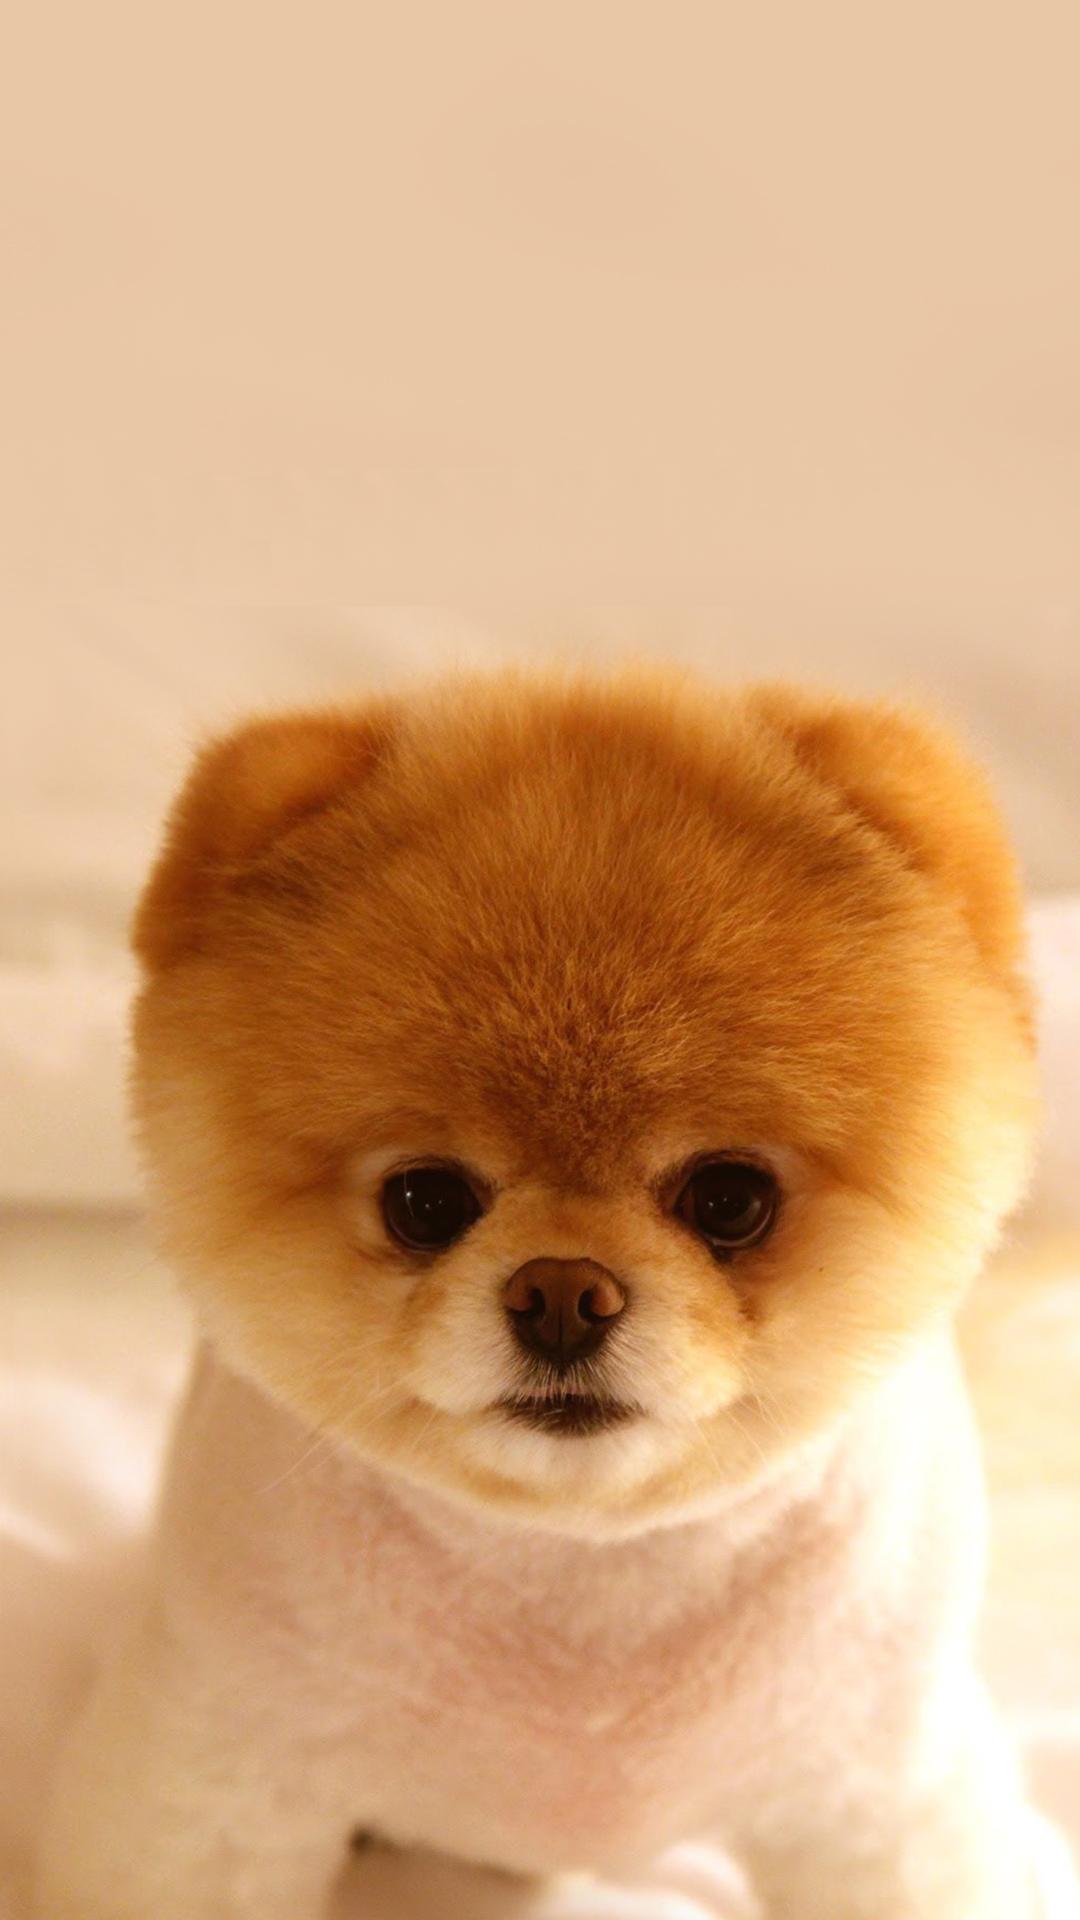 Puppy Cute Wallpaper Home Screen Dog   cuteanimals 1080x1920